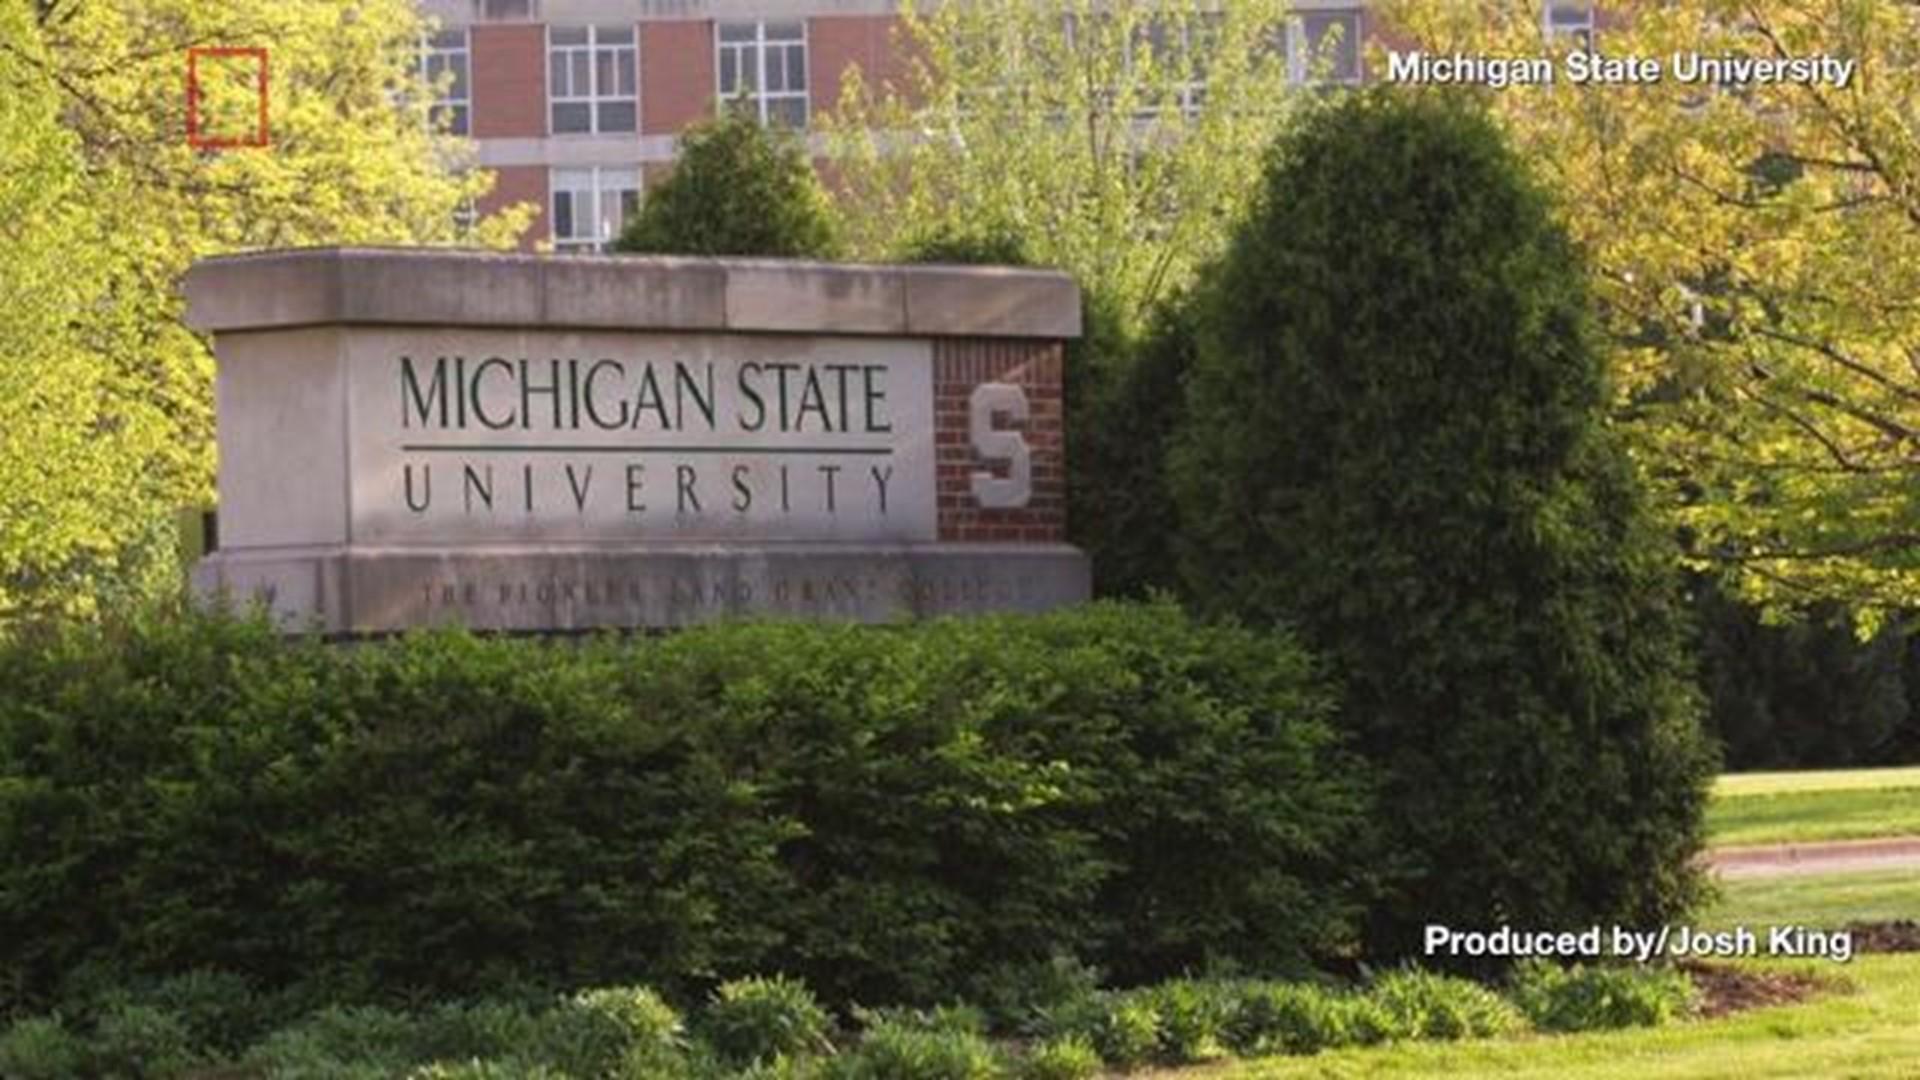 Craigslist ad led investigators to Michigan State health ...